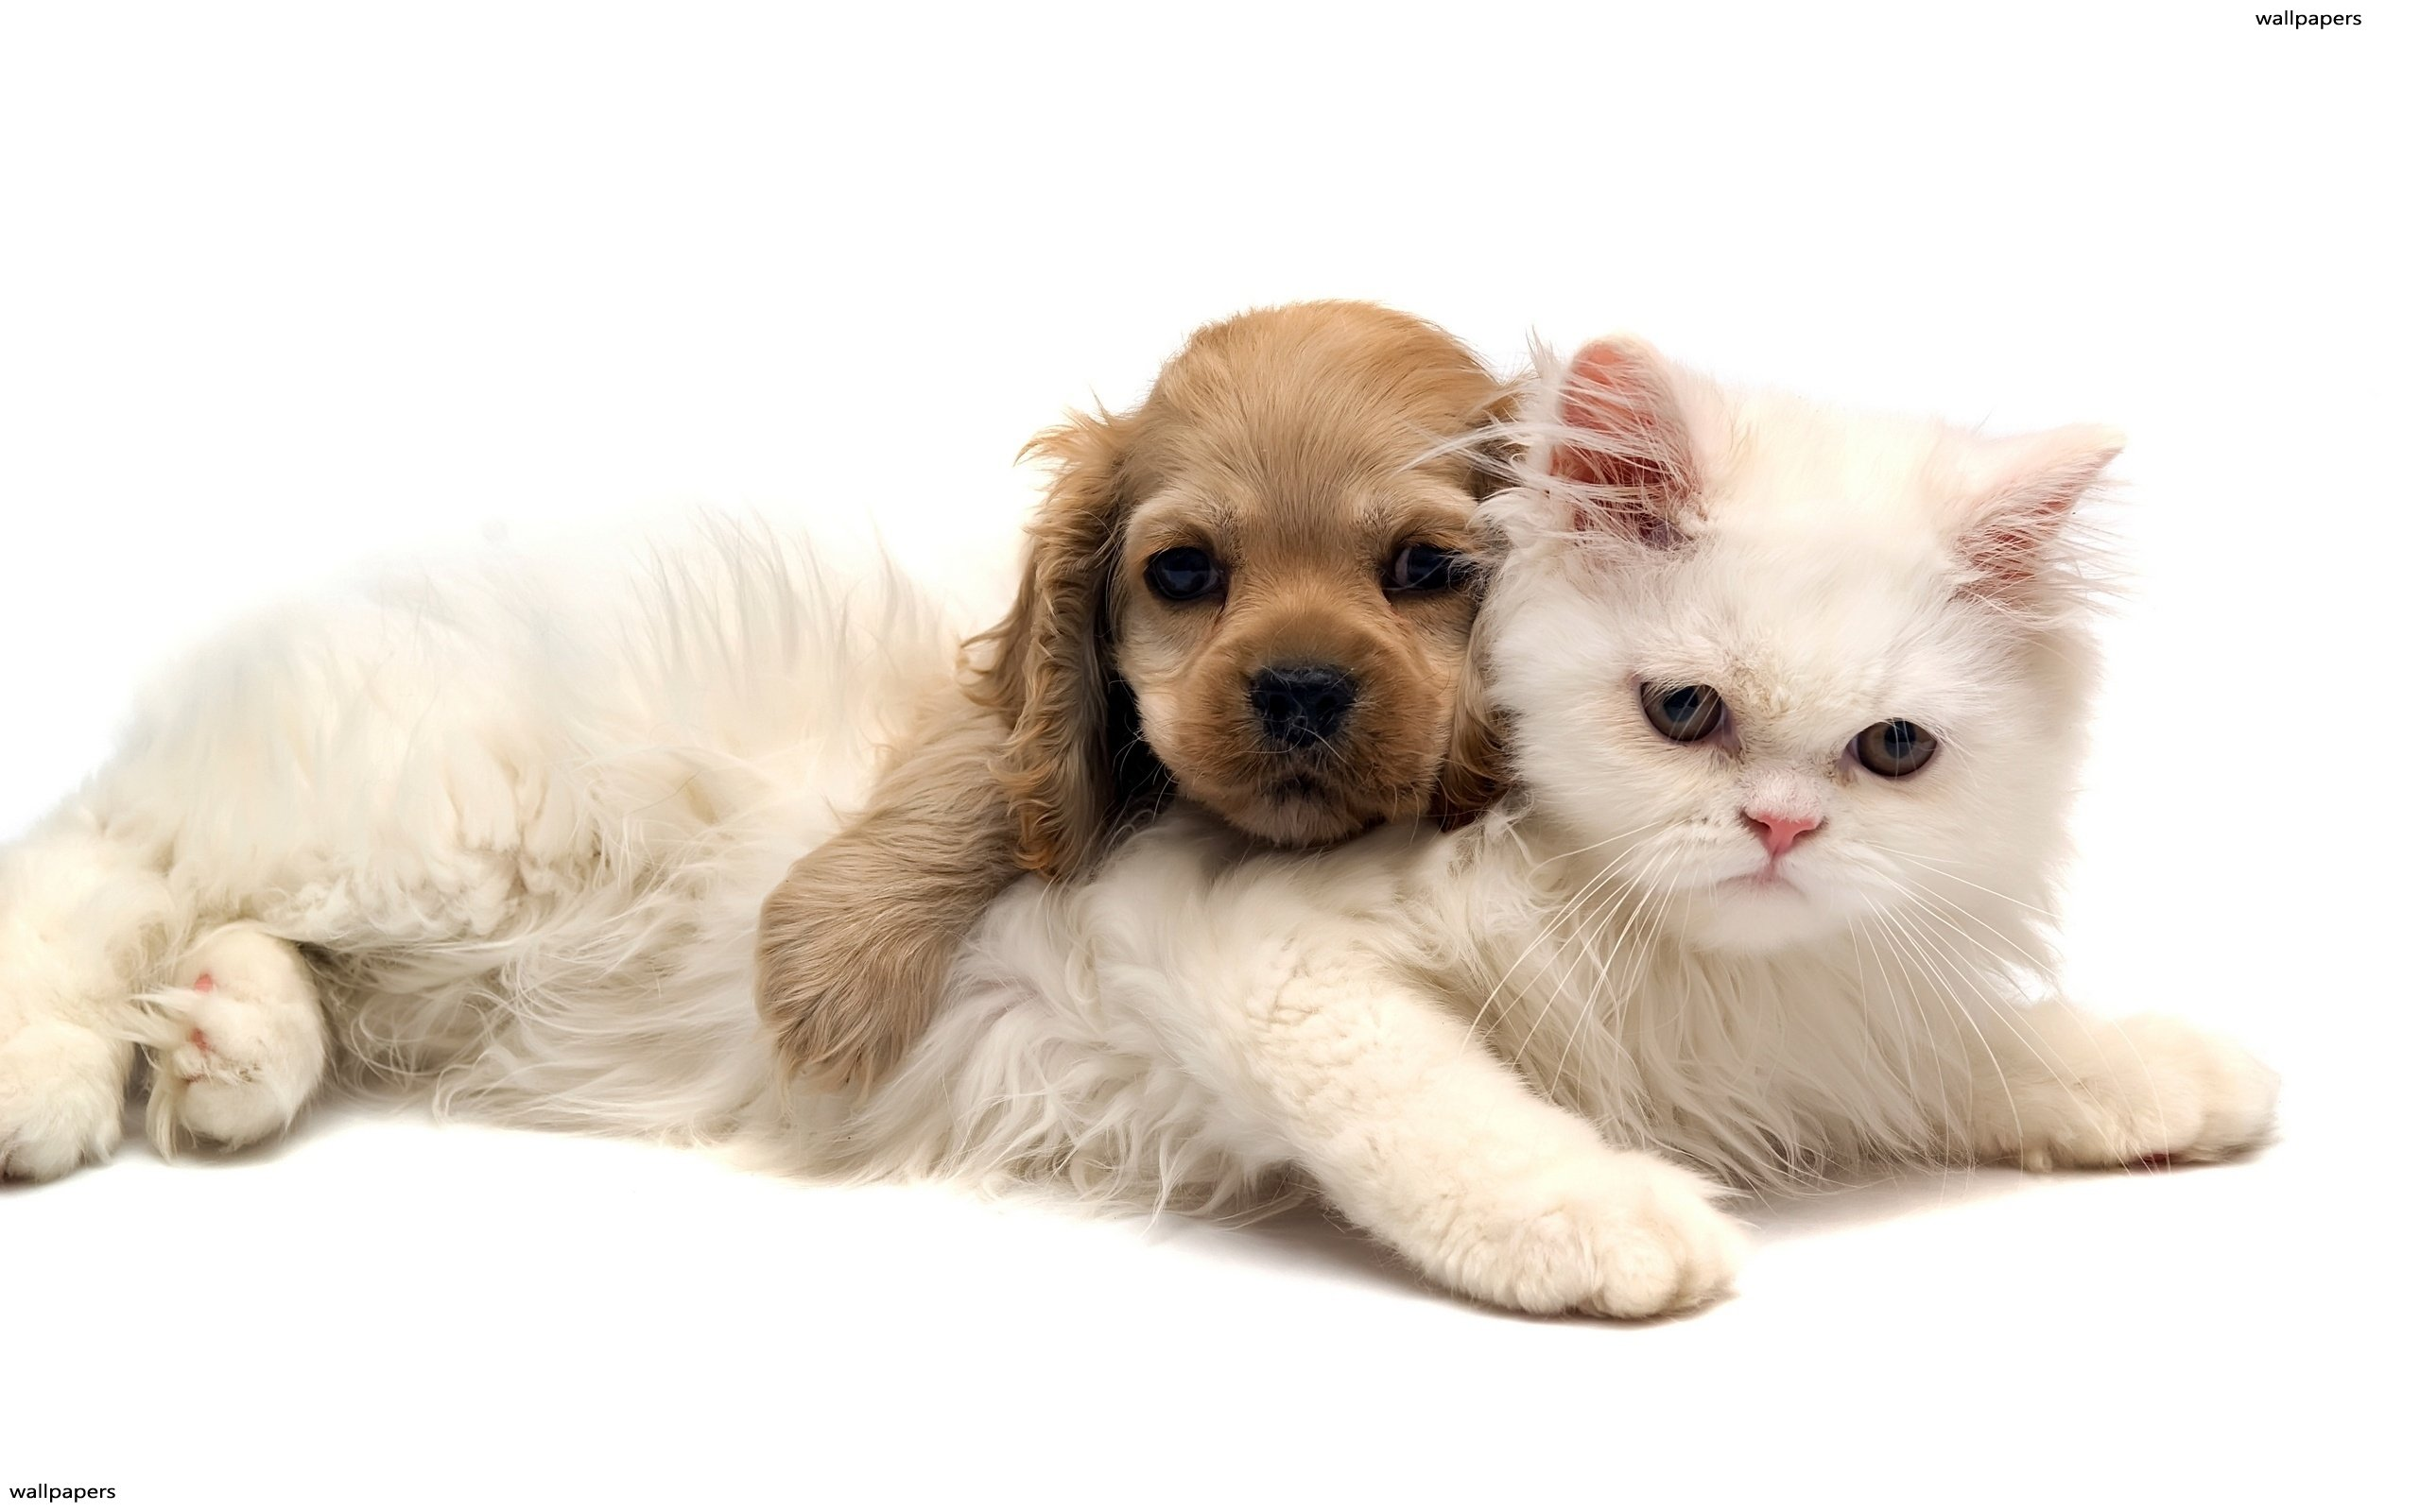 Non-Human Animals & Dementia